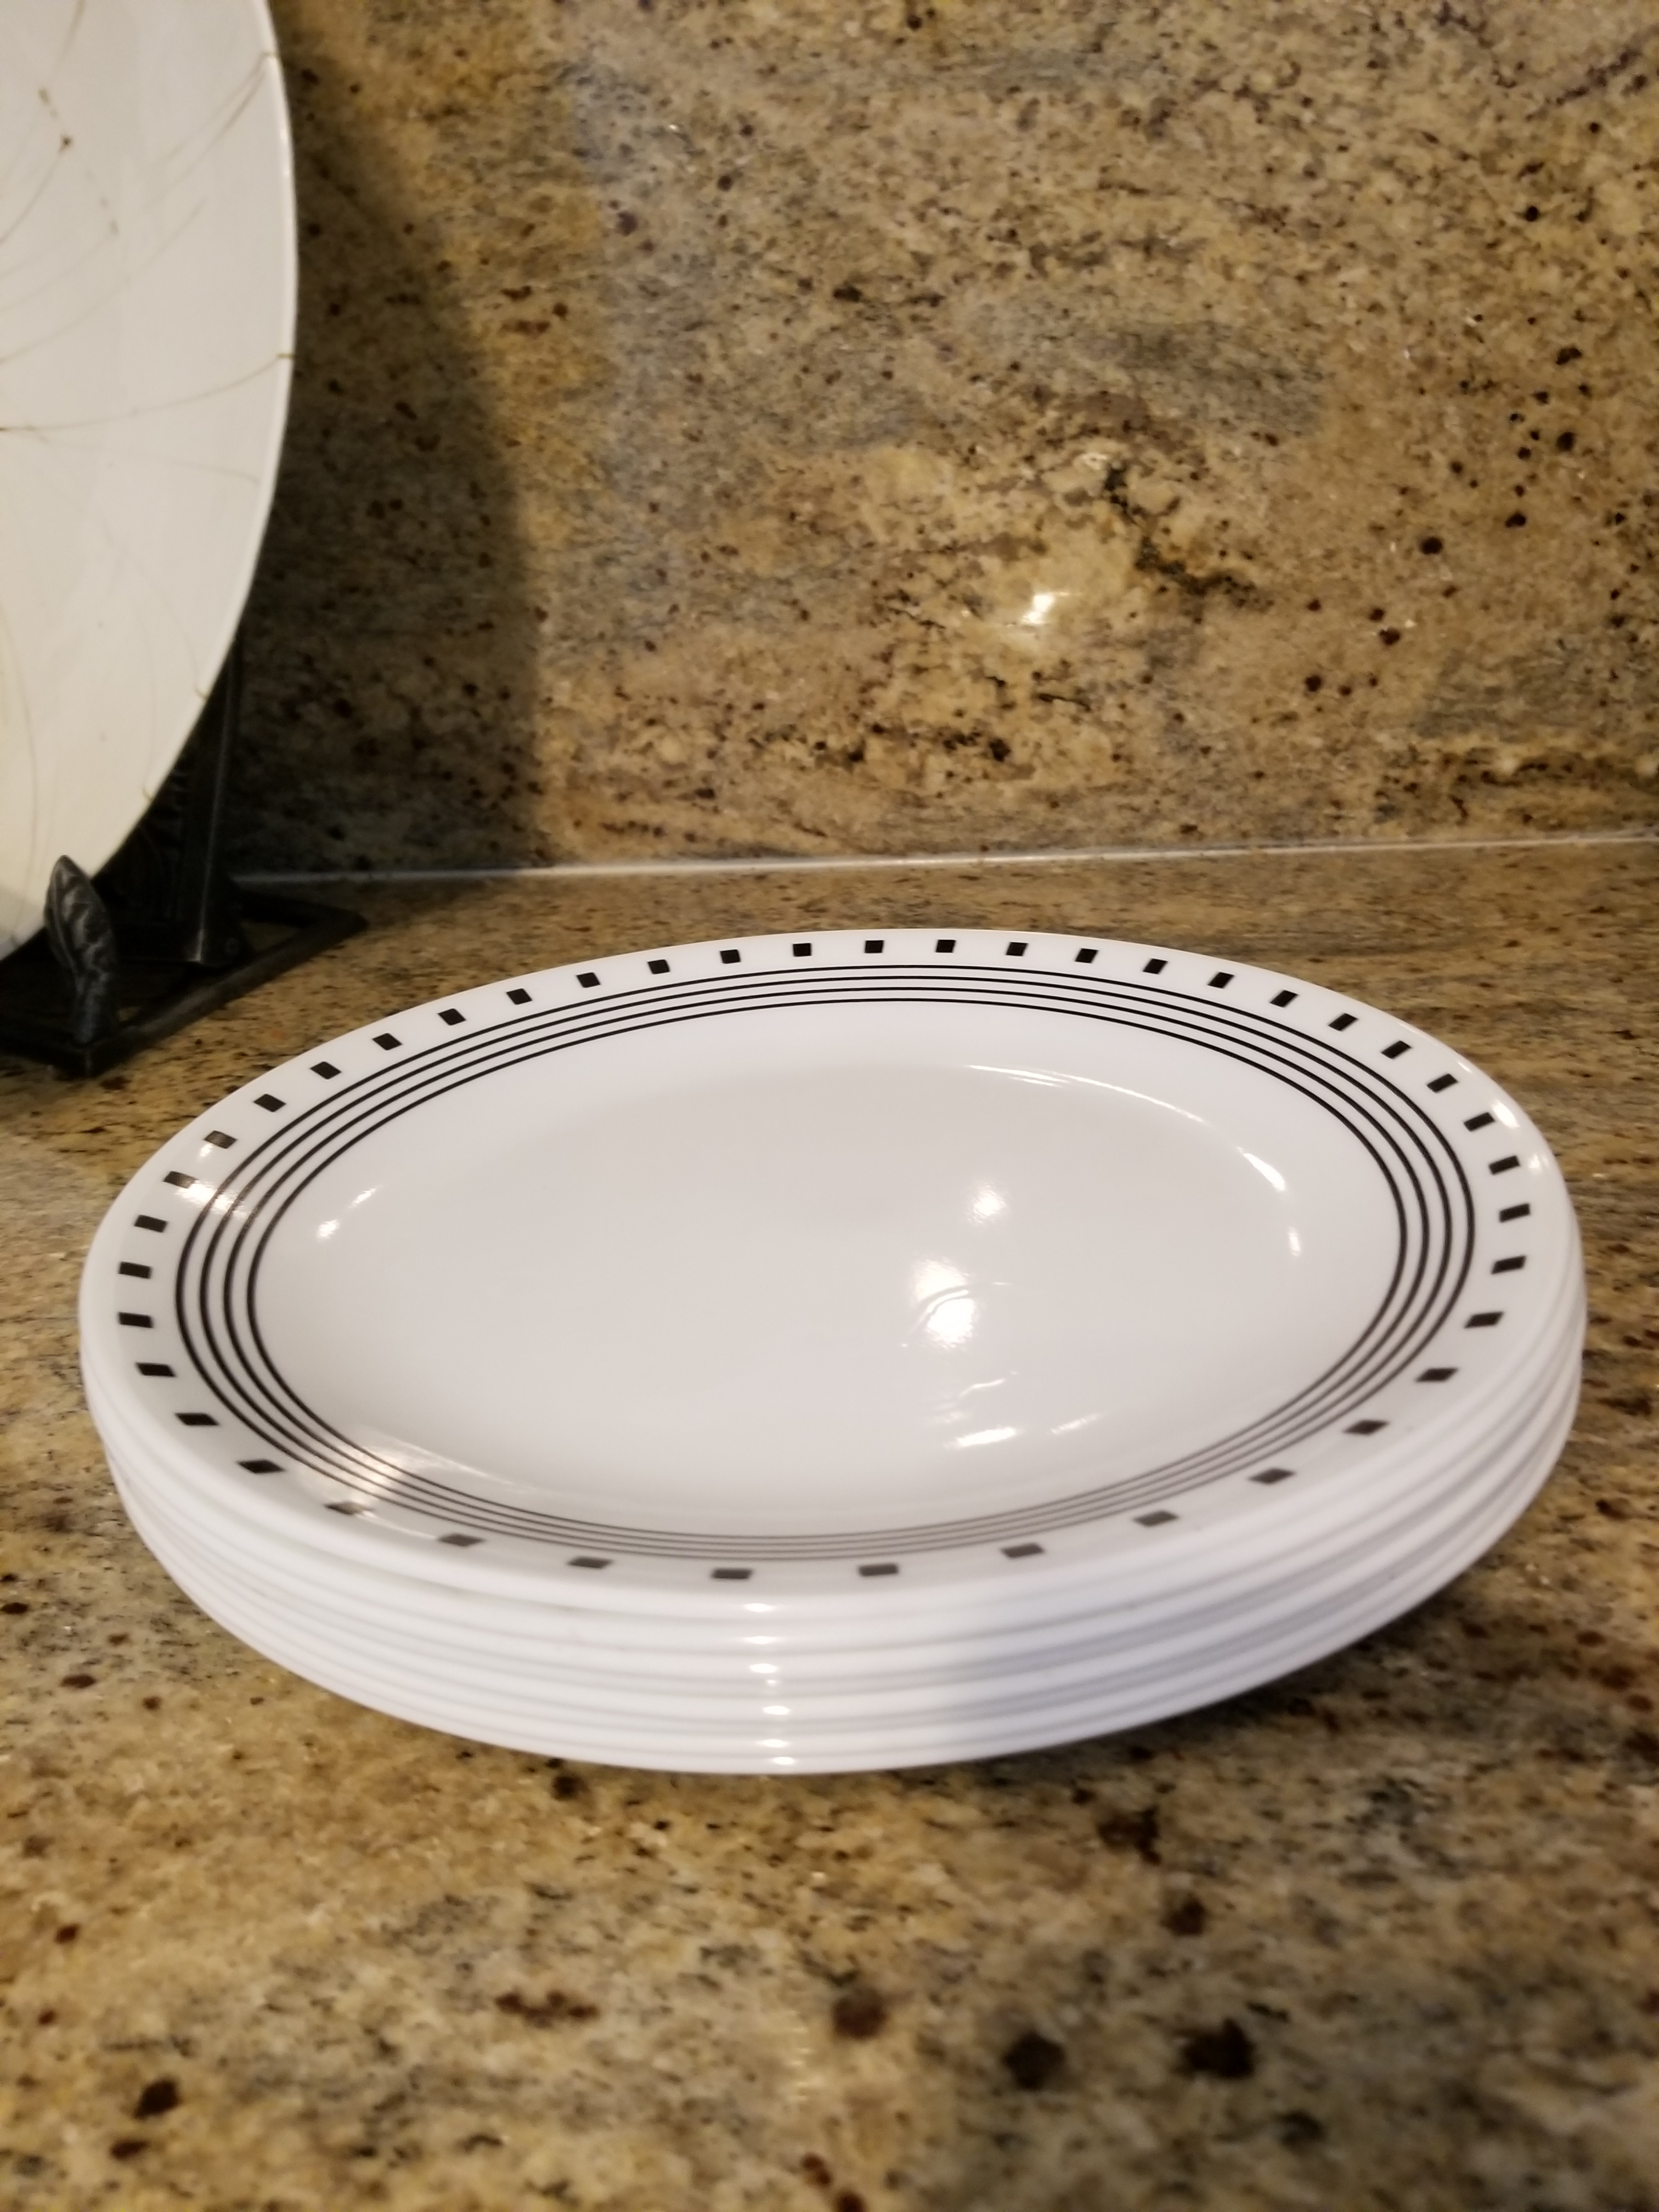 Vintage Black and White Corelle Large Dinner Plates - Set of 8 - Image 5 of  sc 1 st  Chairish & Vintage Black and White Corelle Large Dinner Plates - Set of 8 ...